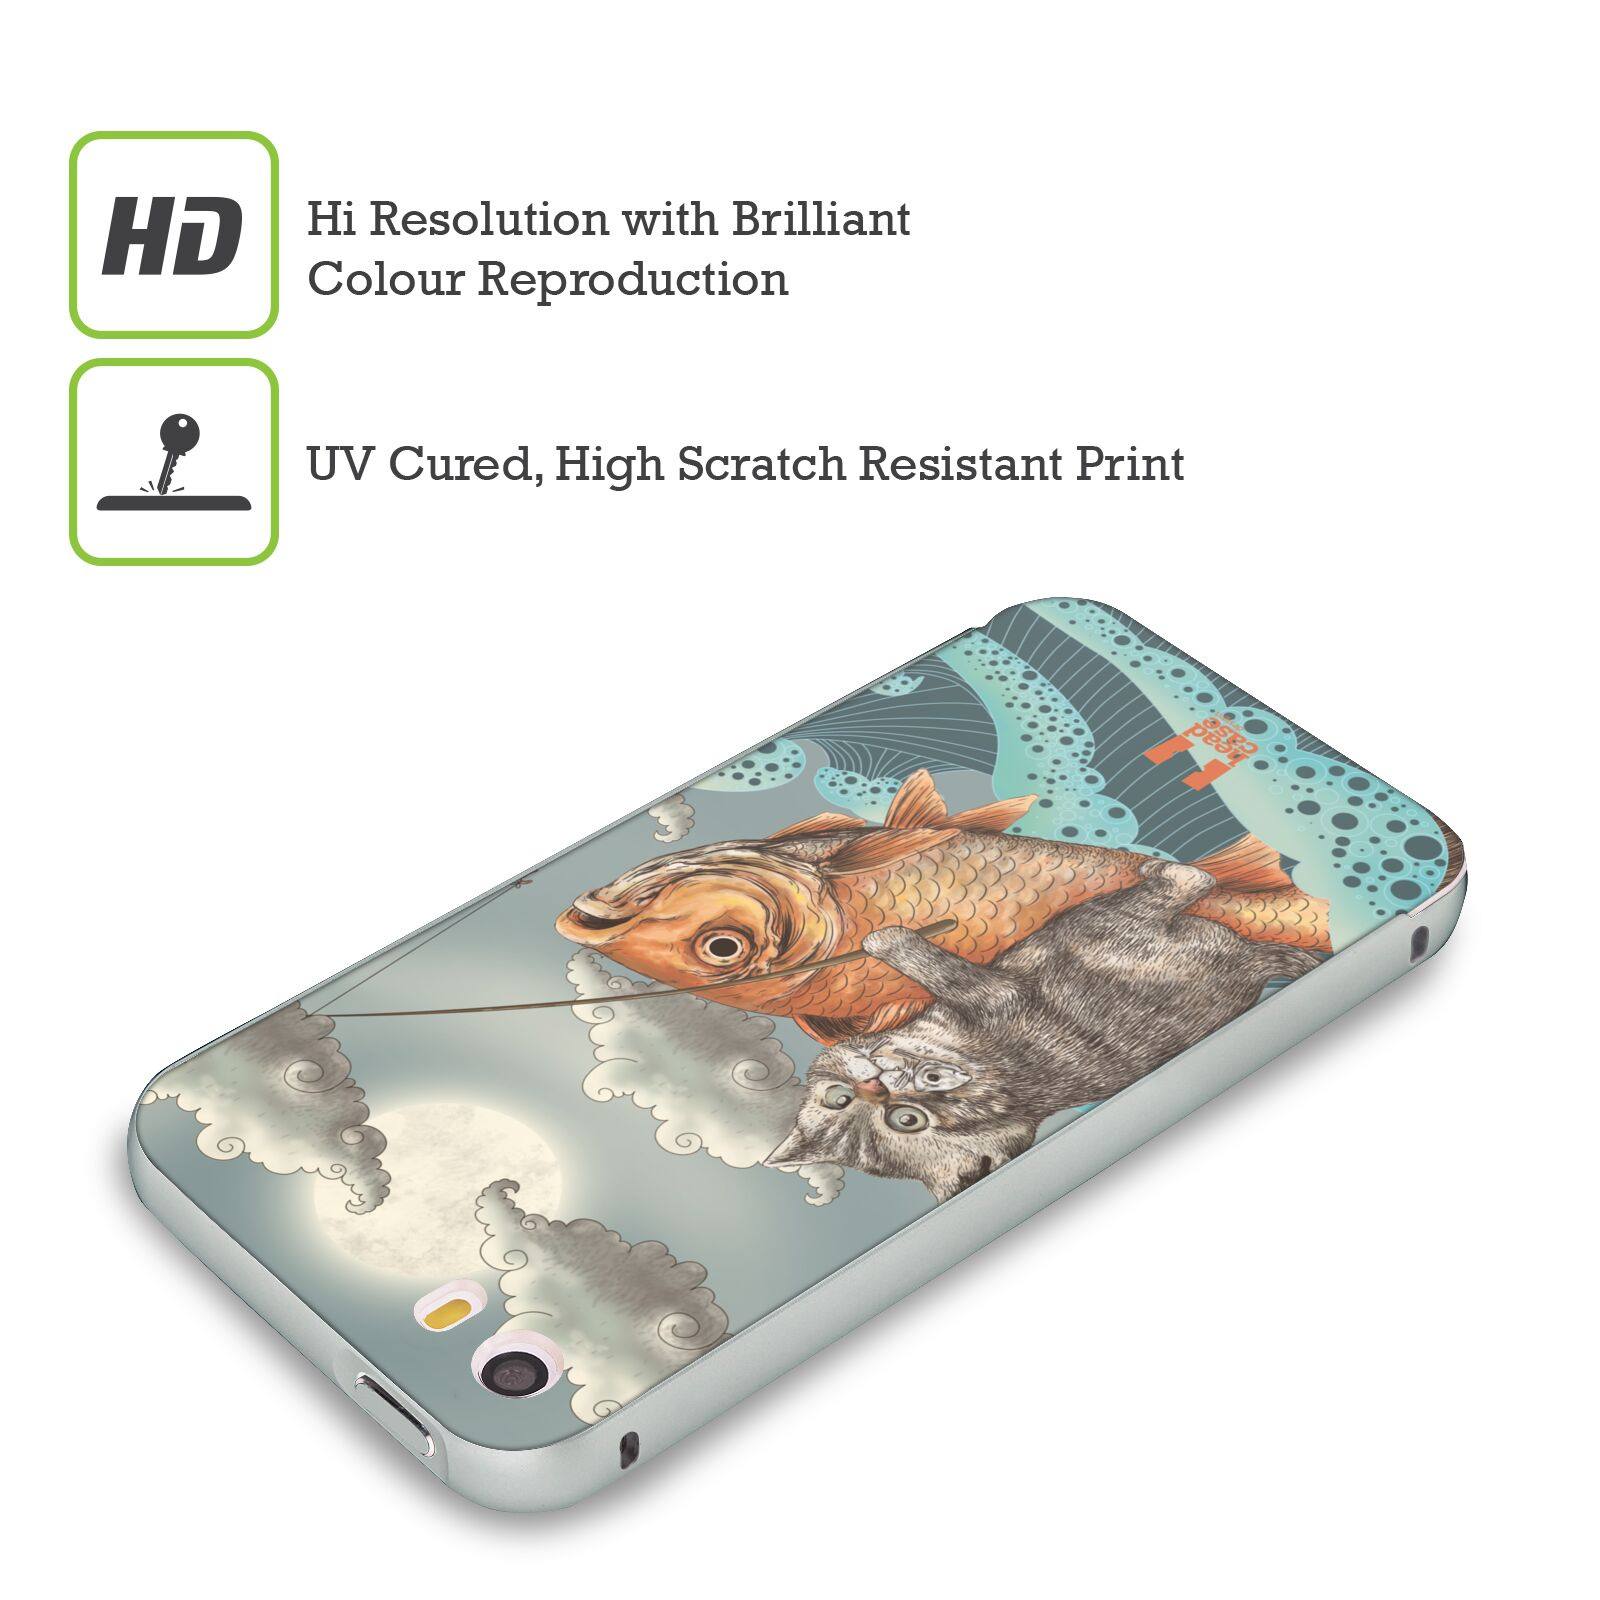 HEAD-CASE-DESIGNS-ANIMAL-FANTASIES-SILVER-SLIDER-CASE-FOR-APPLE-iPHONE-PHONES